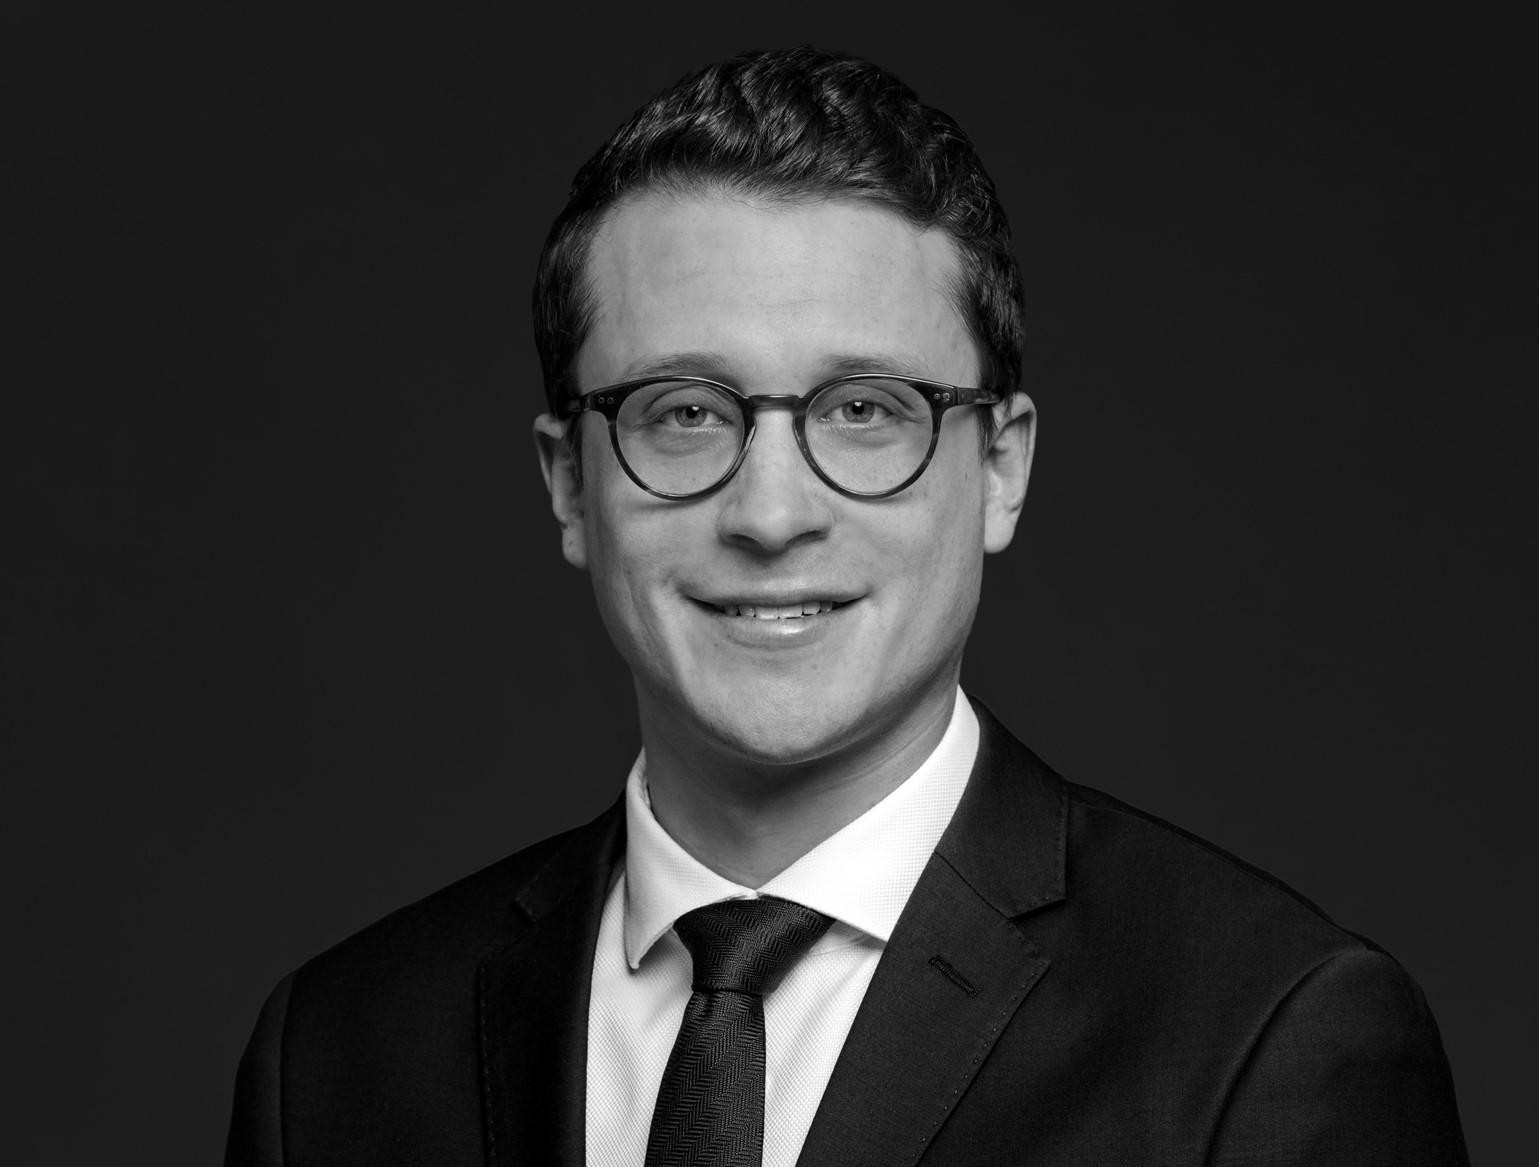 Philipp Schmolke